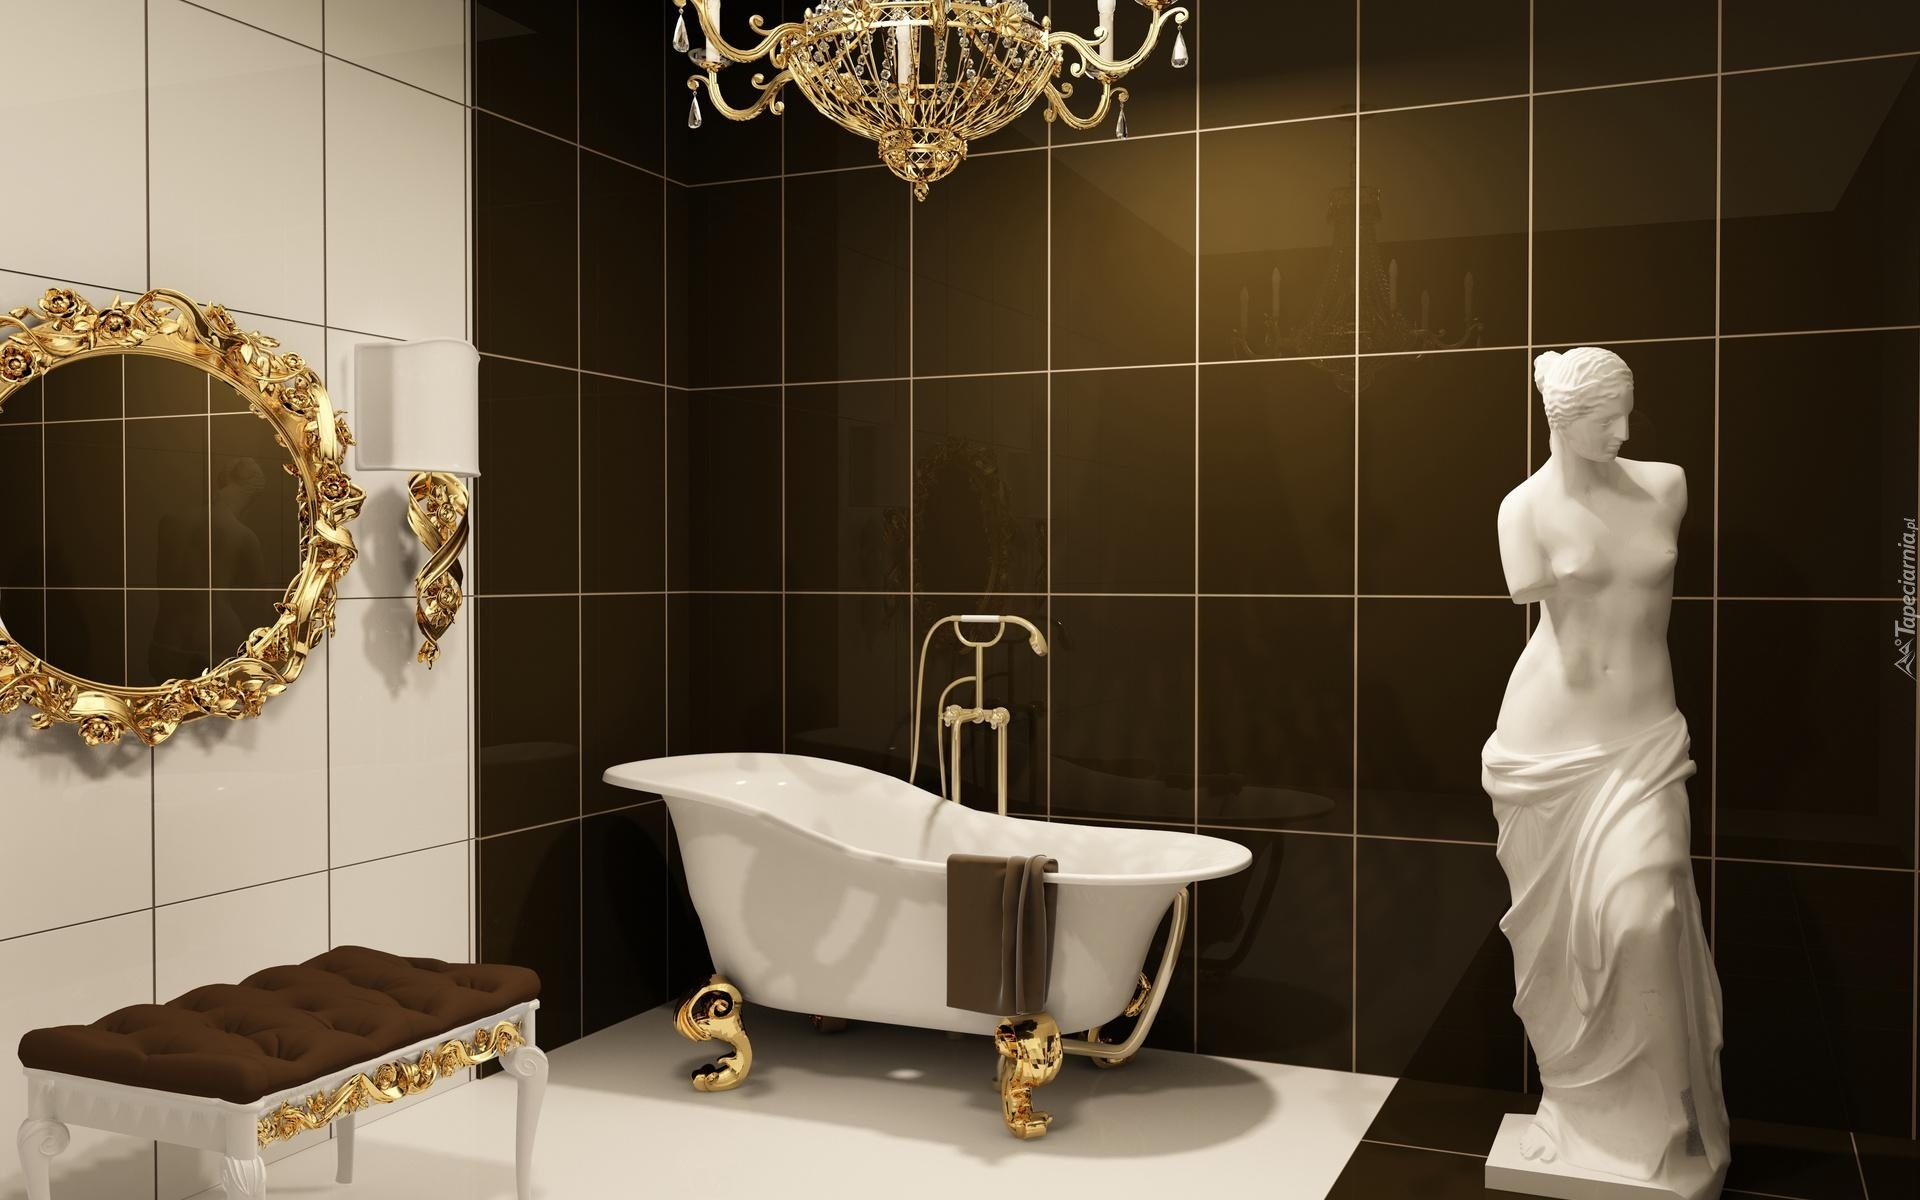 Dom łazienka Wanna Lustro Figurka Lustro